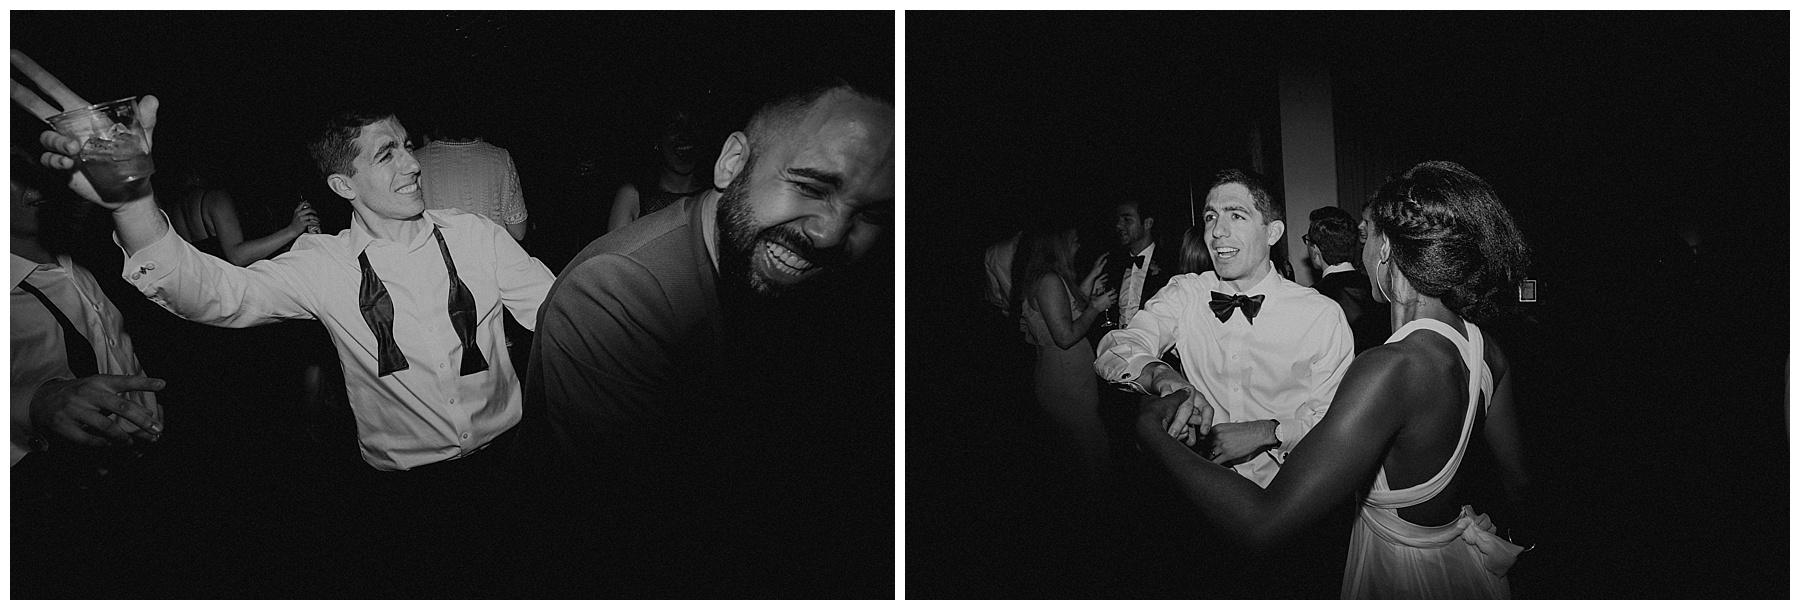 Rialto Theatre Tampa Wedding Photographer-145.jpg